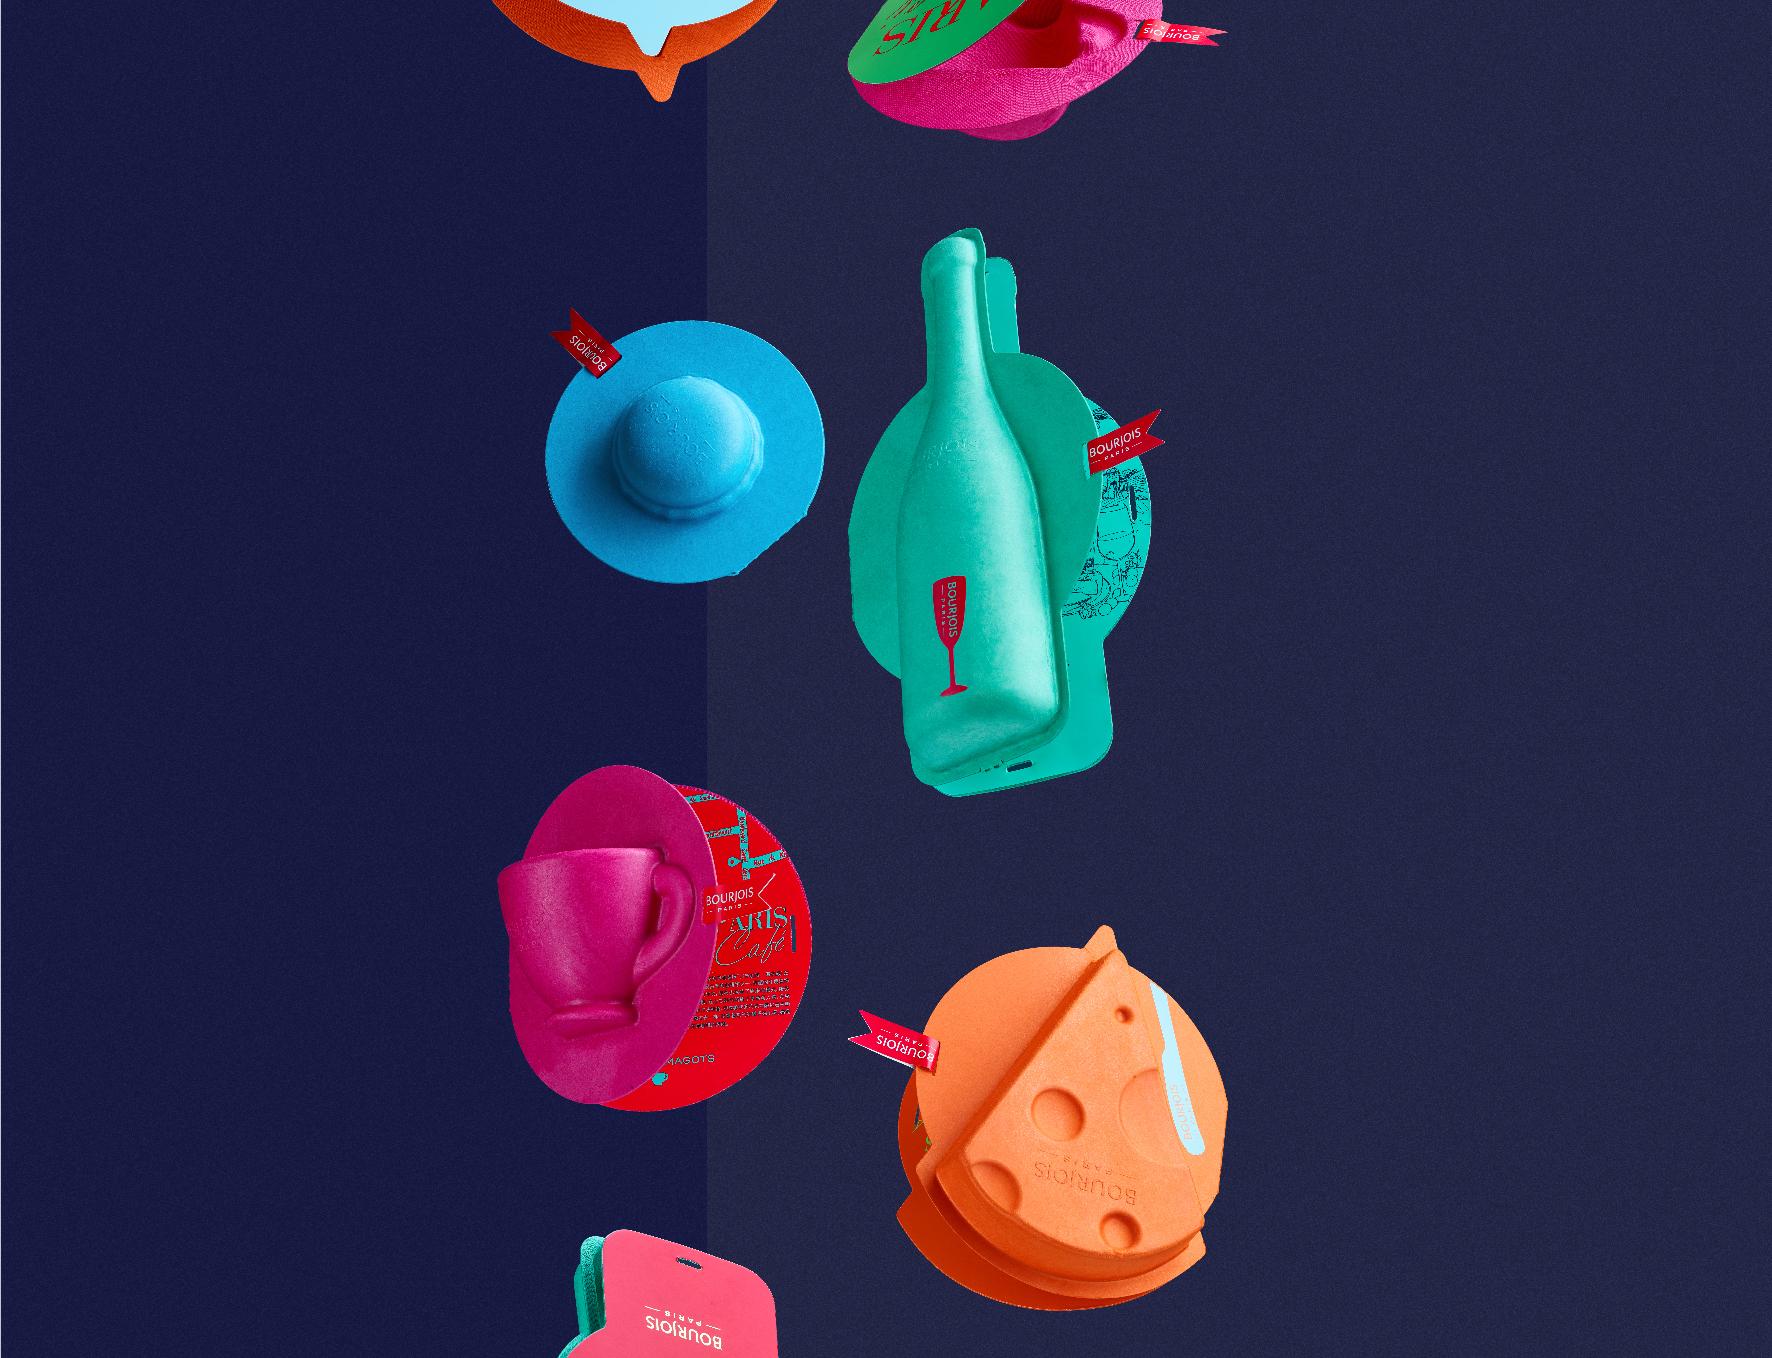 Bon Appetit, Paris Client: BOURJOIS Design Company: NX CREATIVE Art Director / Designer: Guozheng Jiang / Dan Chen